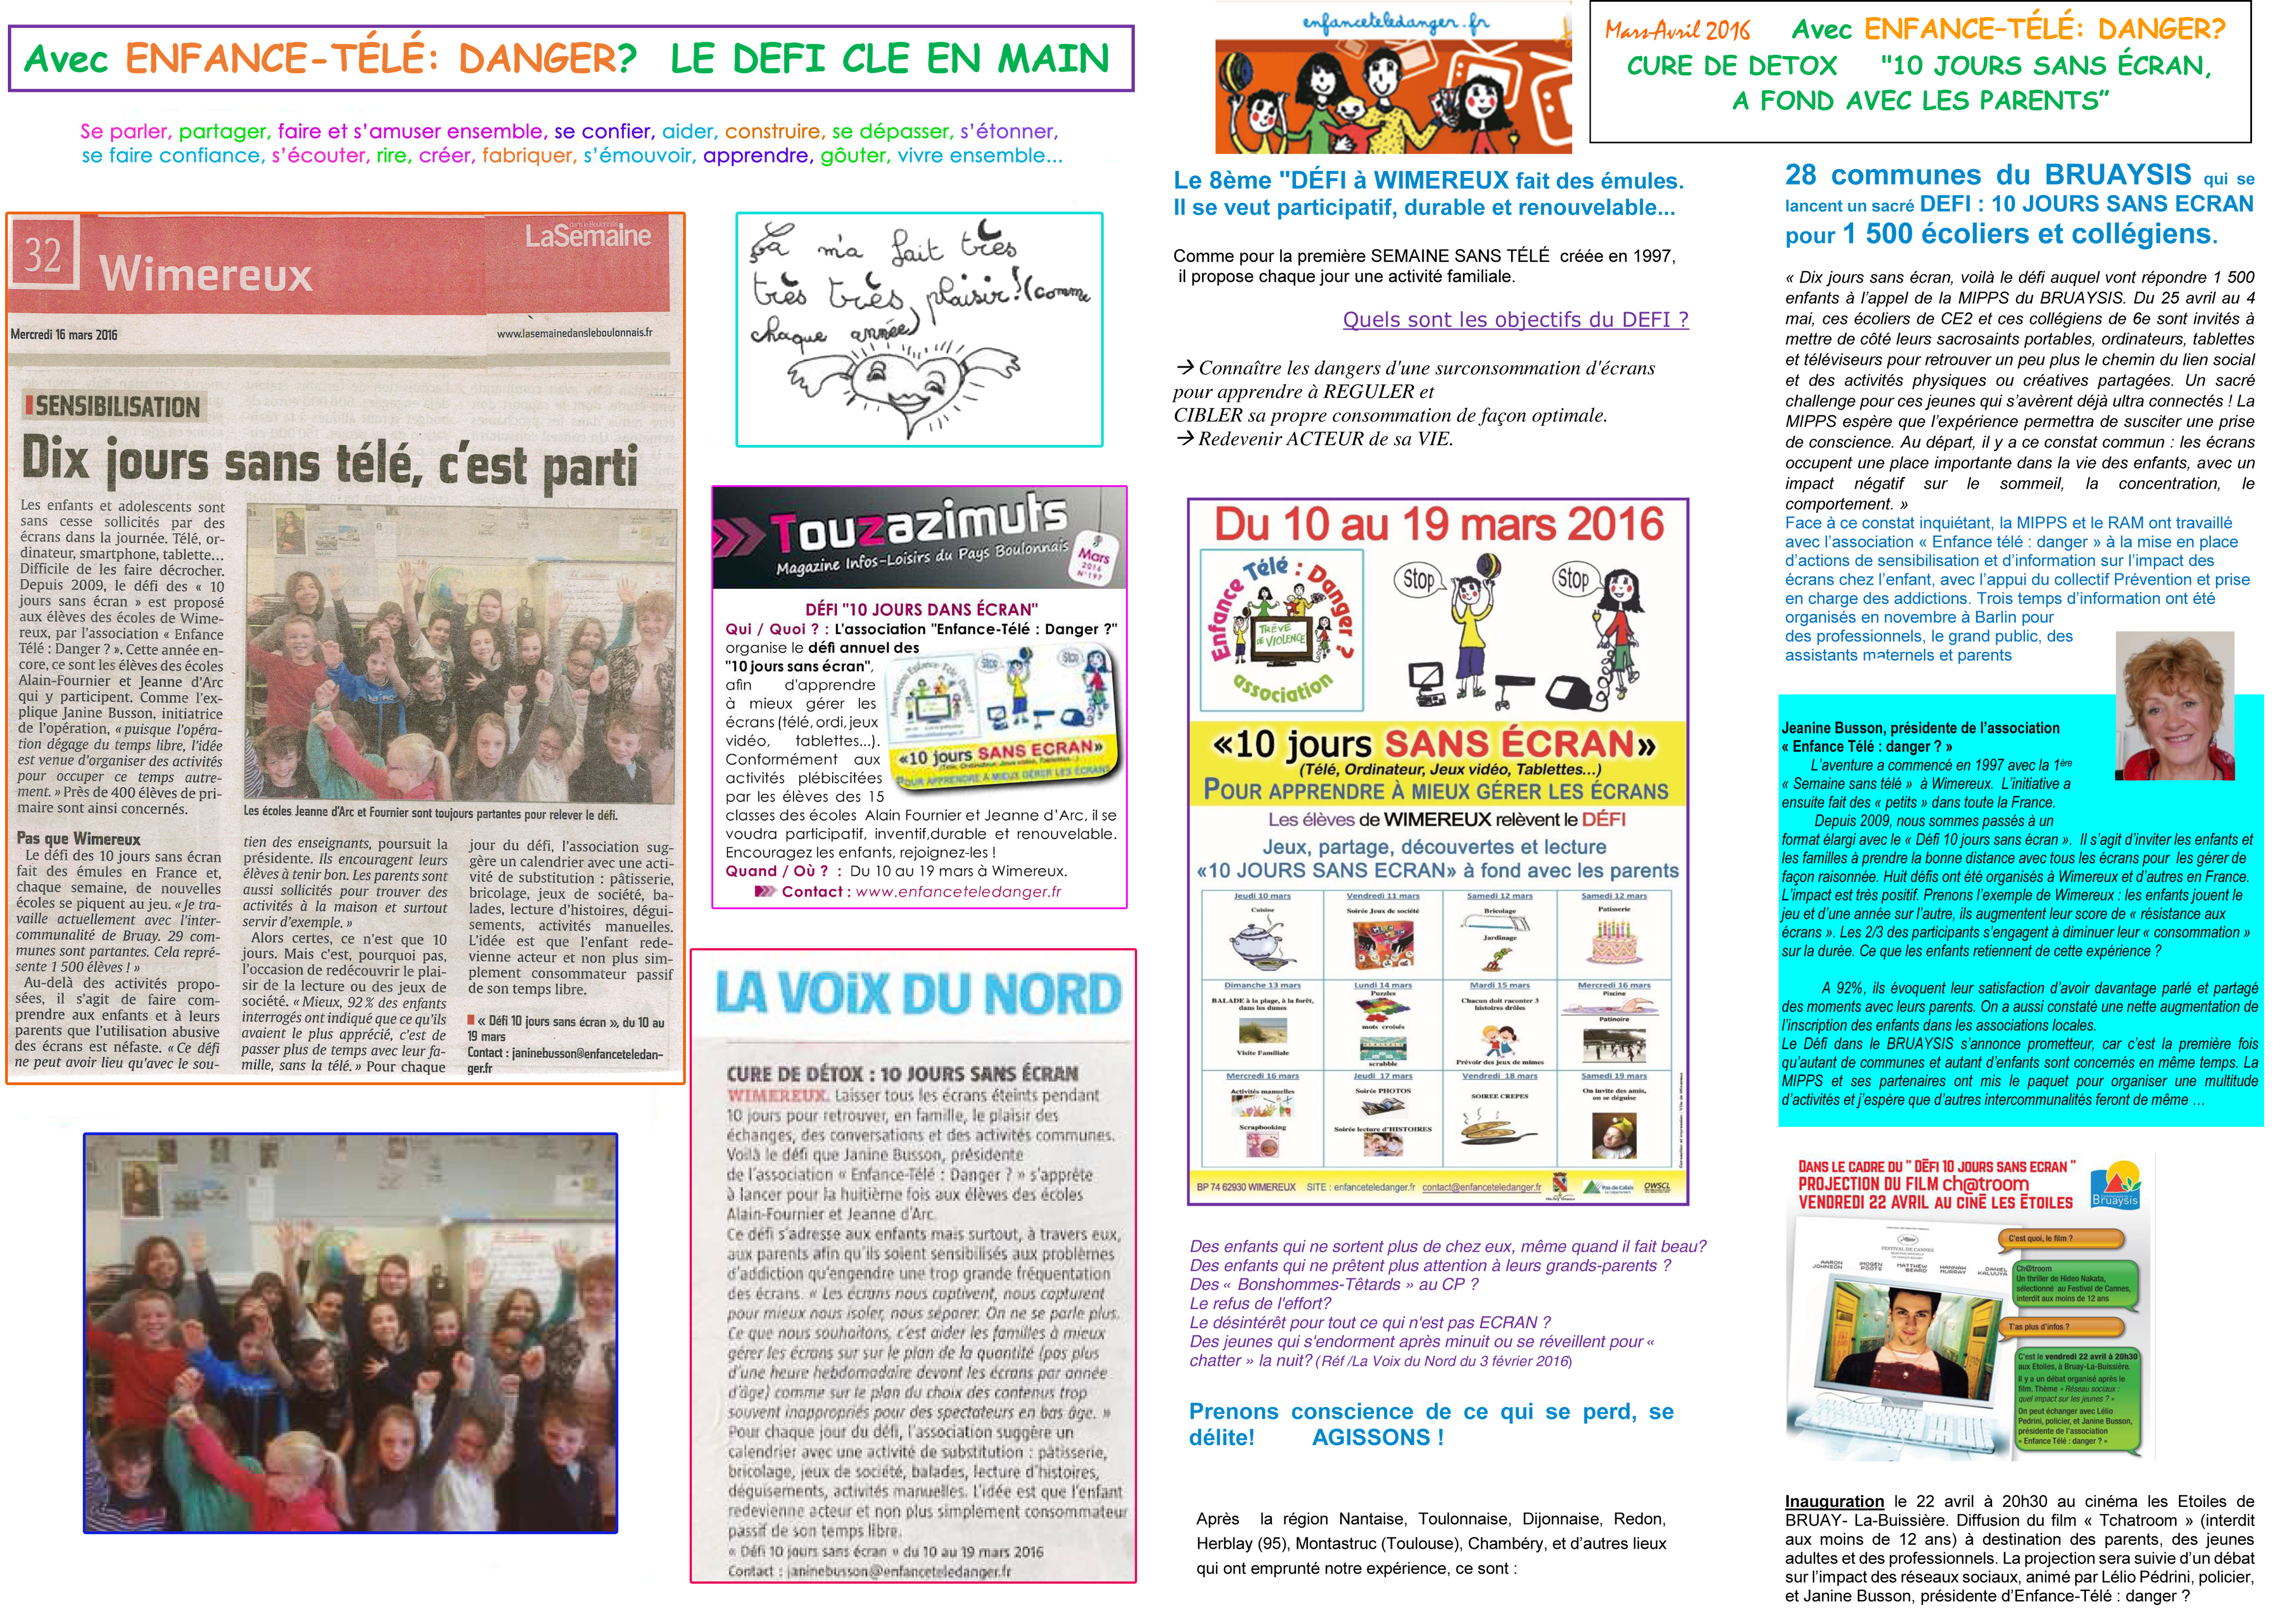 page1defi-wimereux-defi-bruaysis-p4-bilan-defi-wimereux